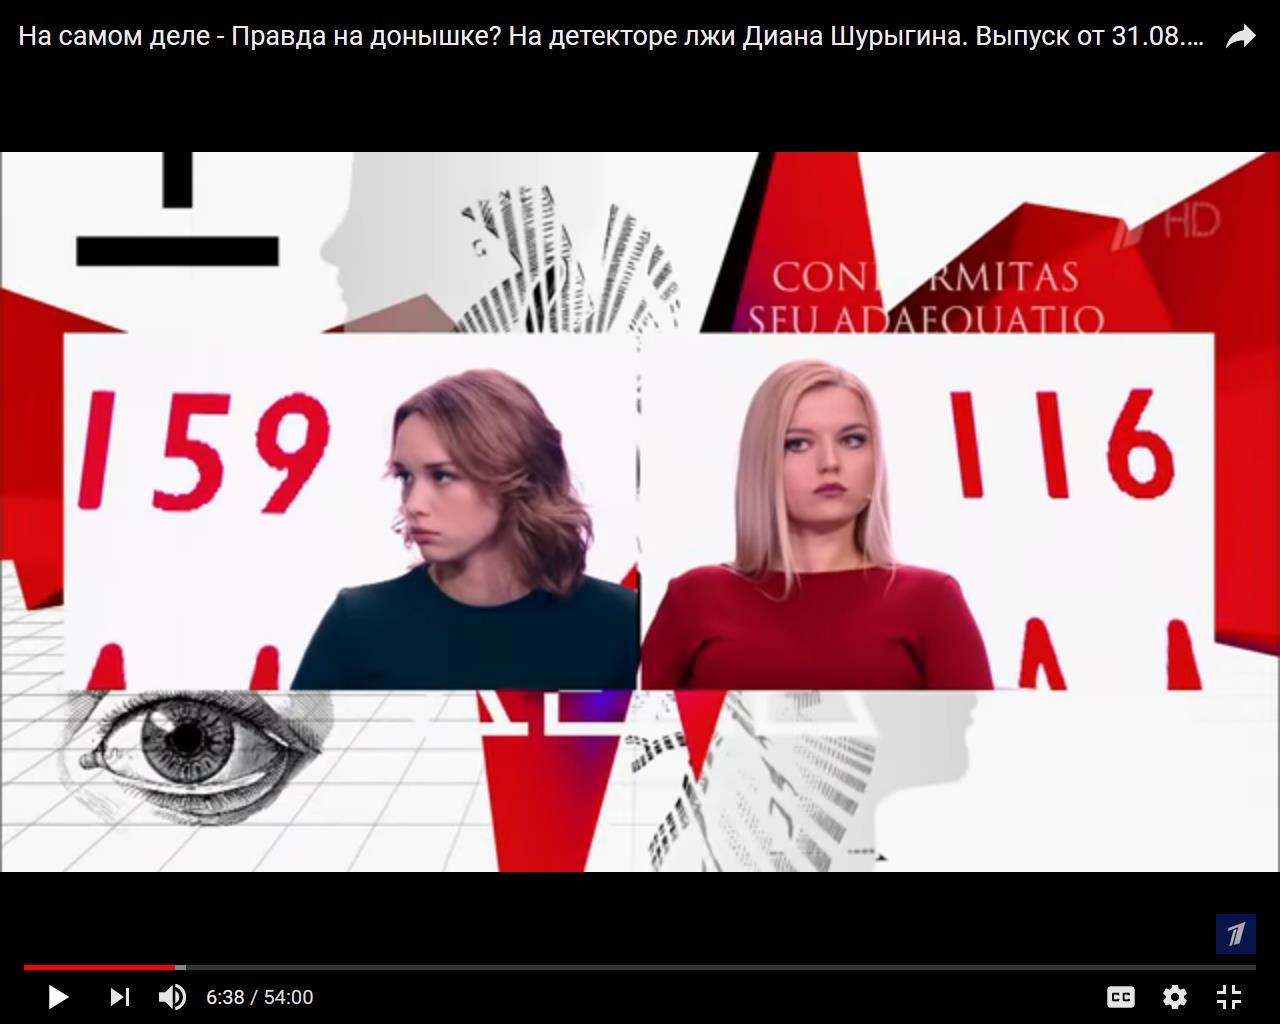 http://images.vfl.ru/ii/1504779187/5ecd4b39/18512076.jpg